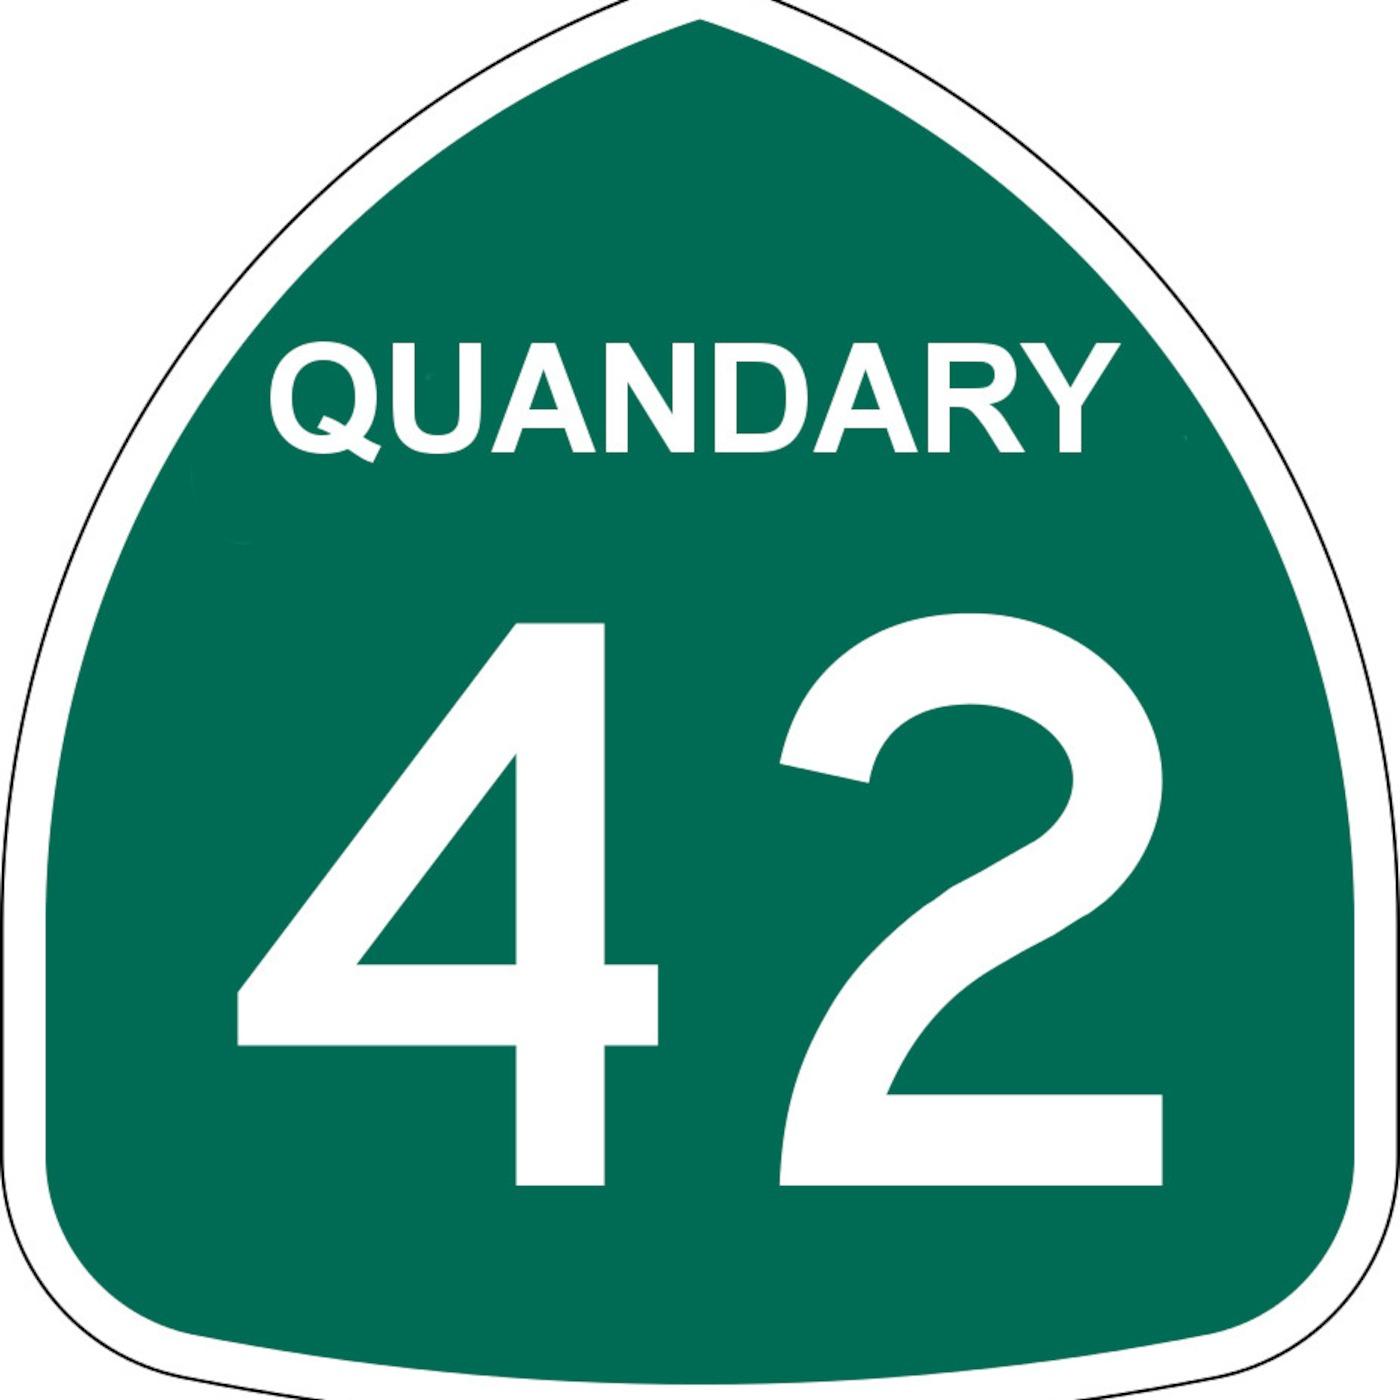 Quandry 42